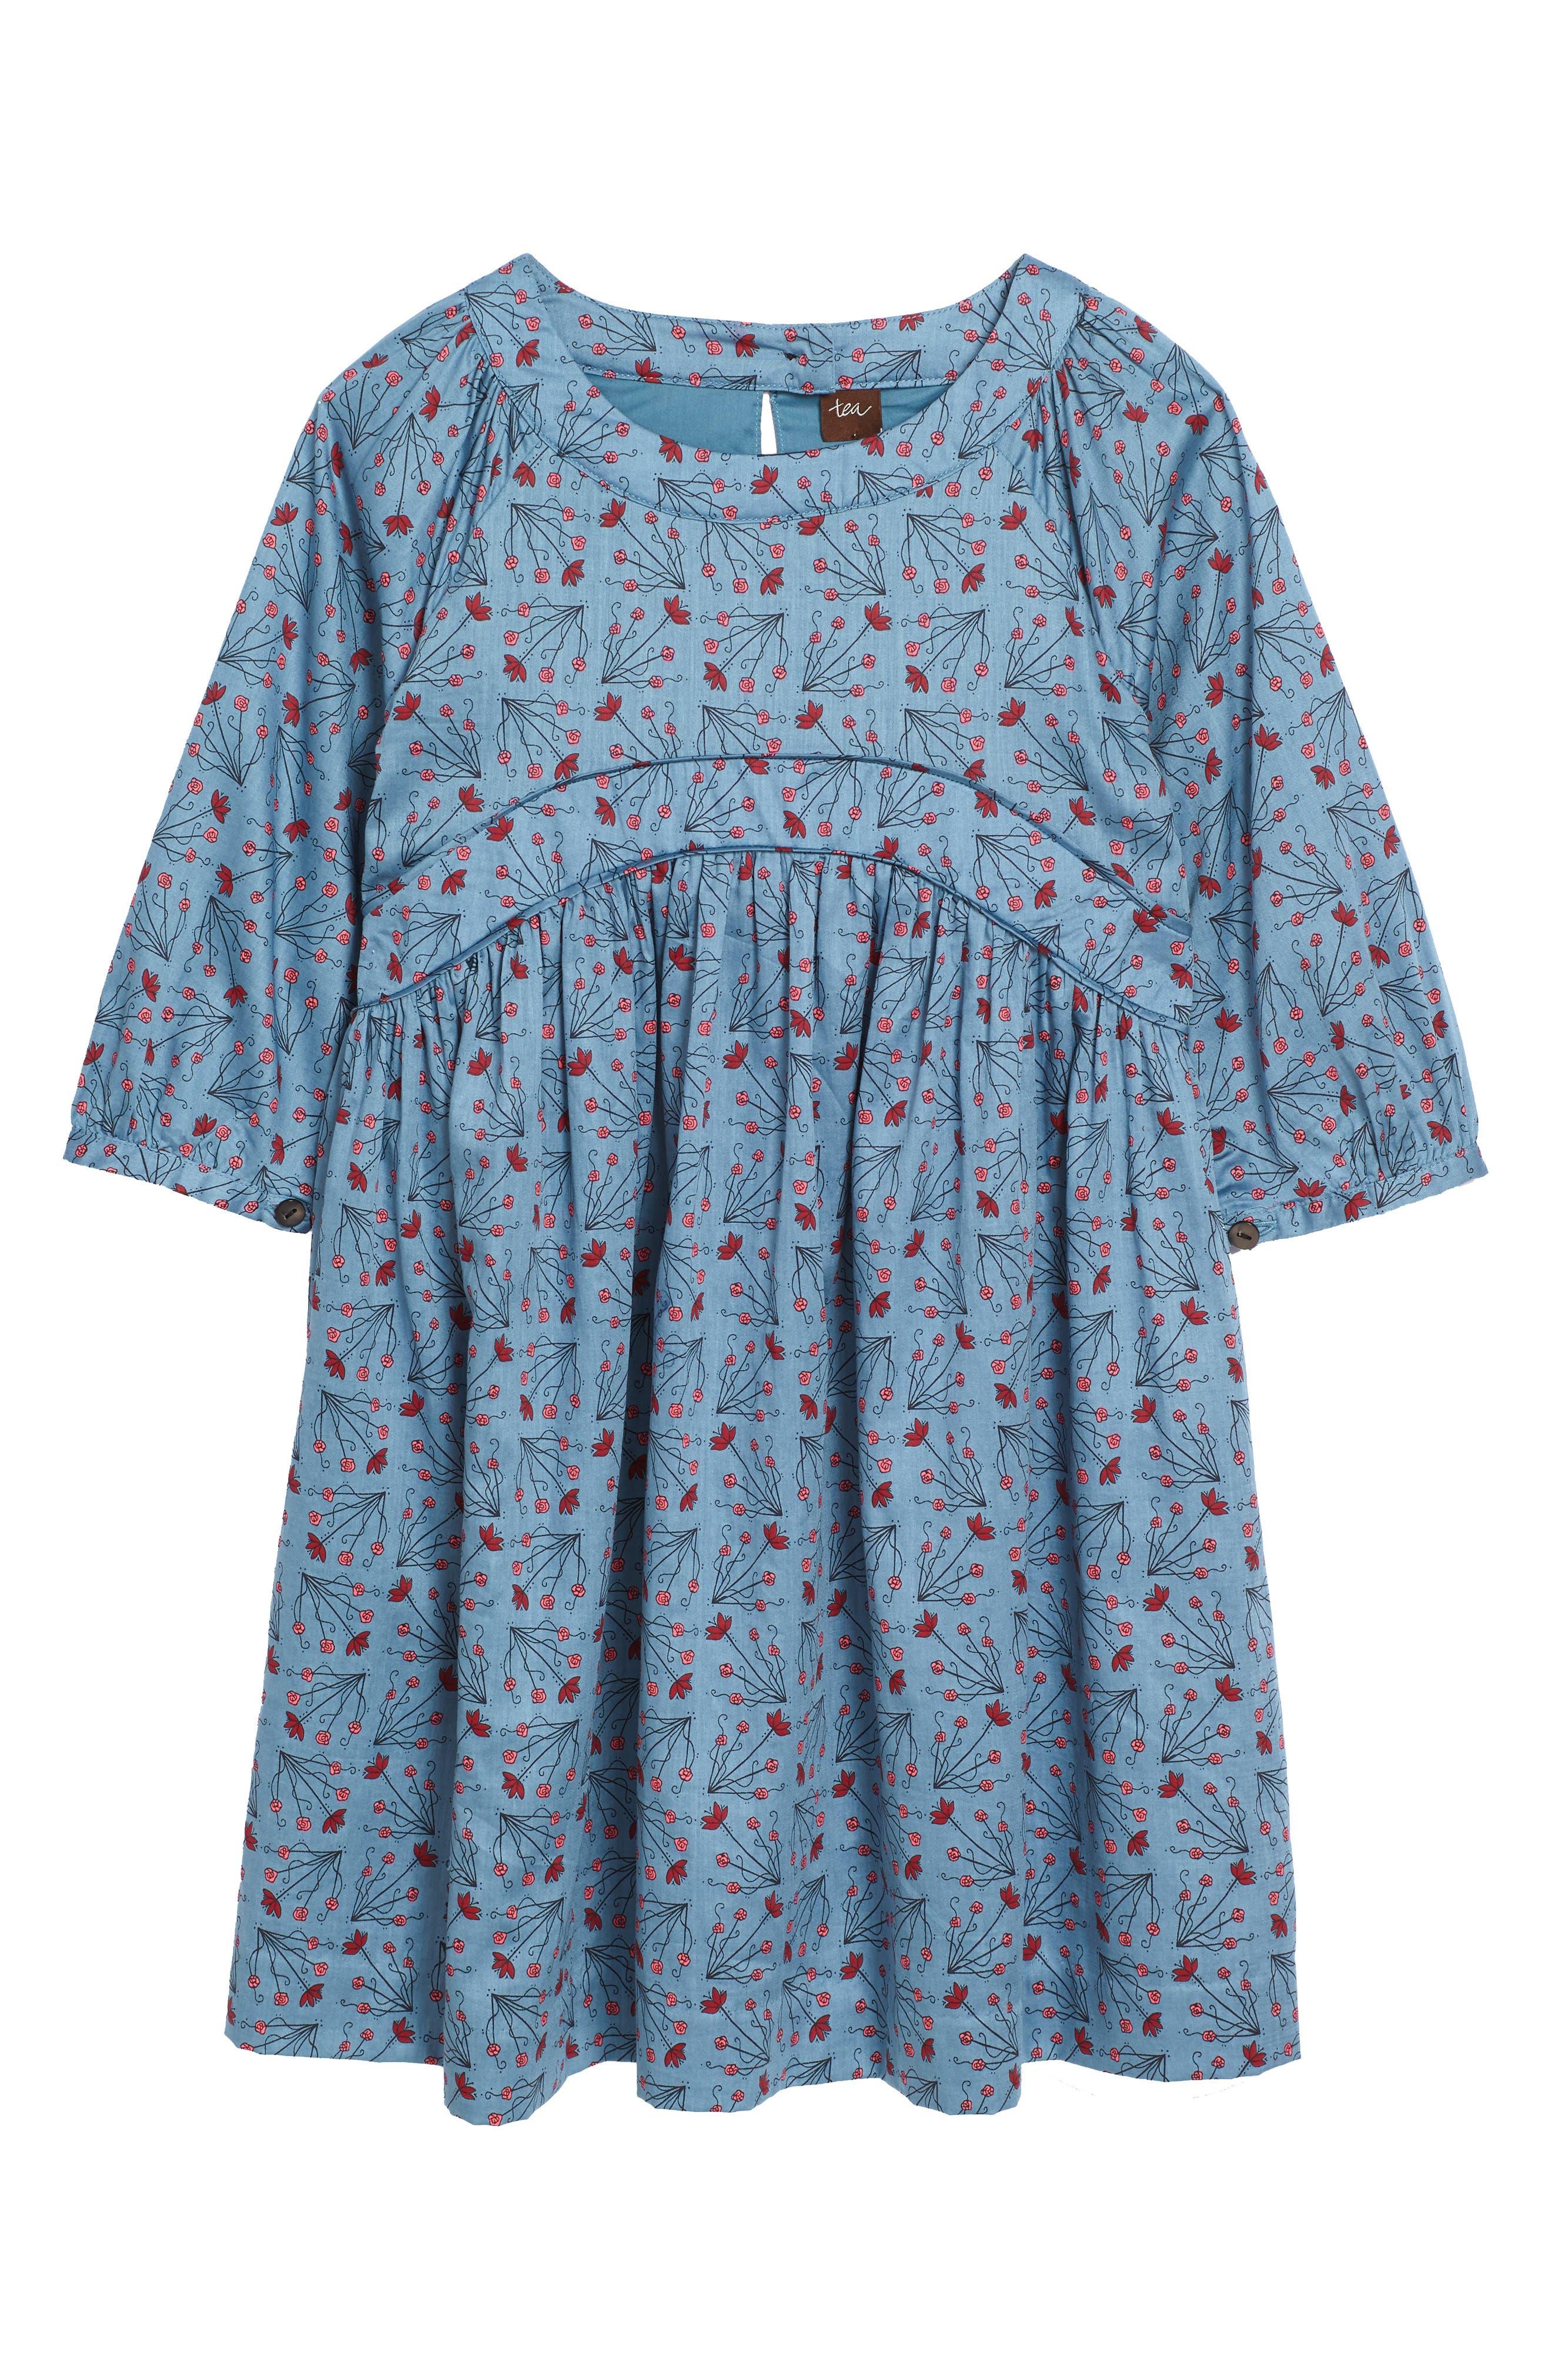 Alternate Image 1 Selected - Tea Collection Aviemore Empire Dress (Toddler Girls, Little Girls & Big Girls)